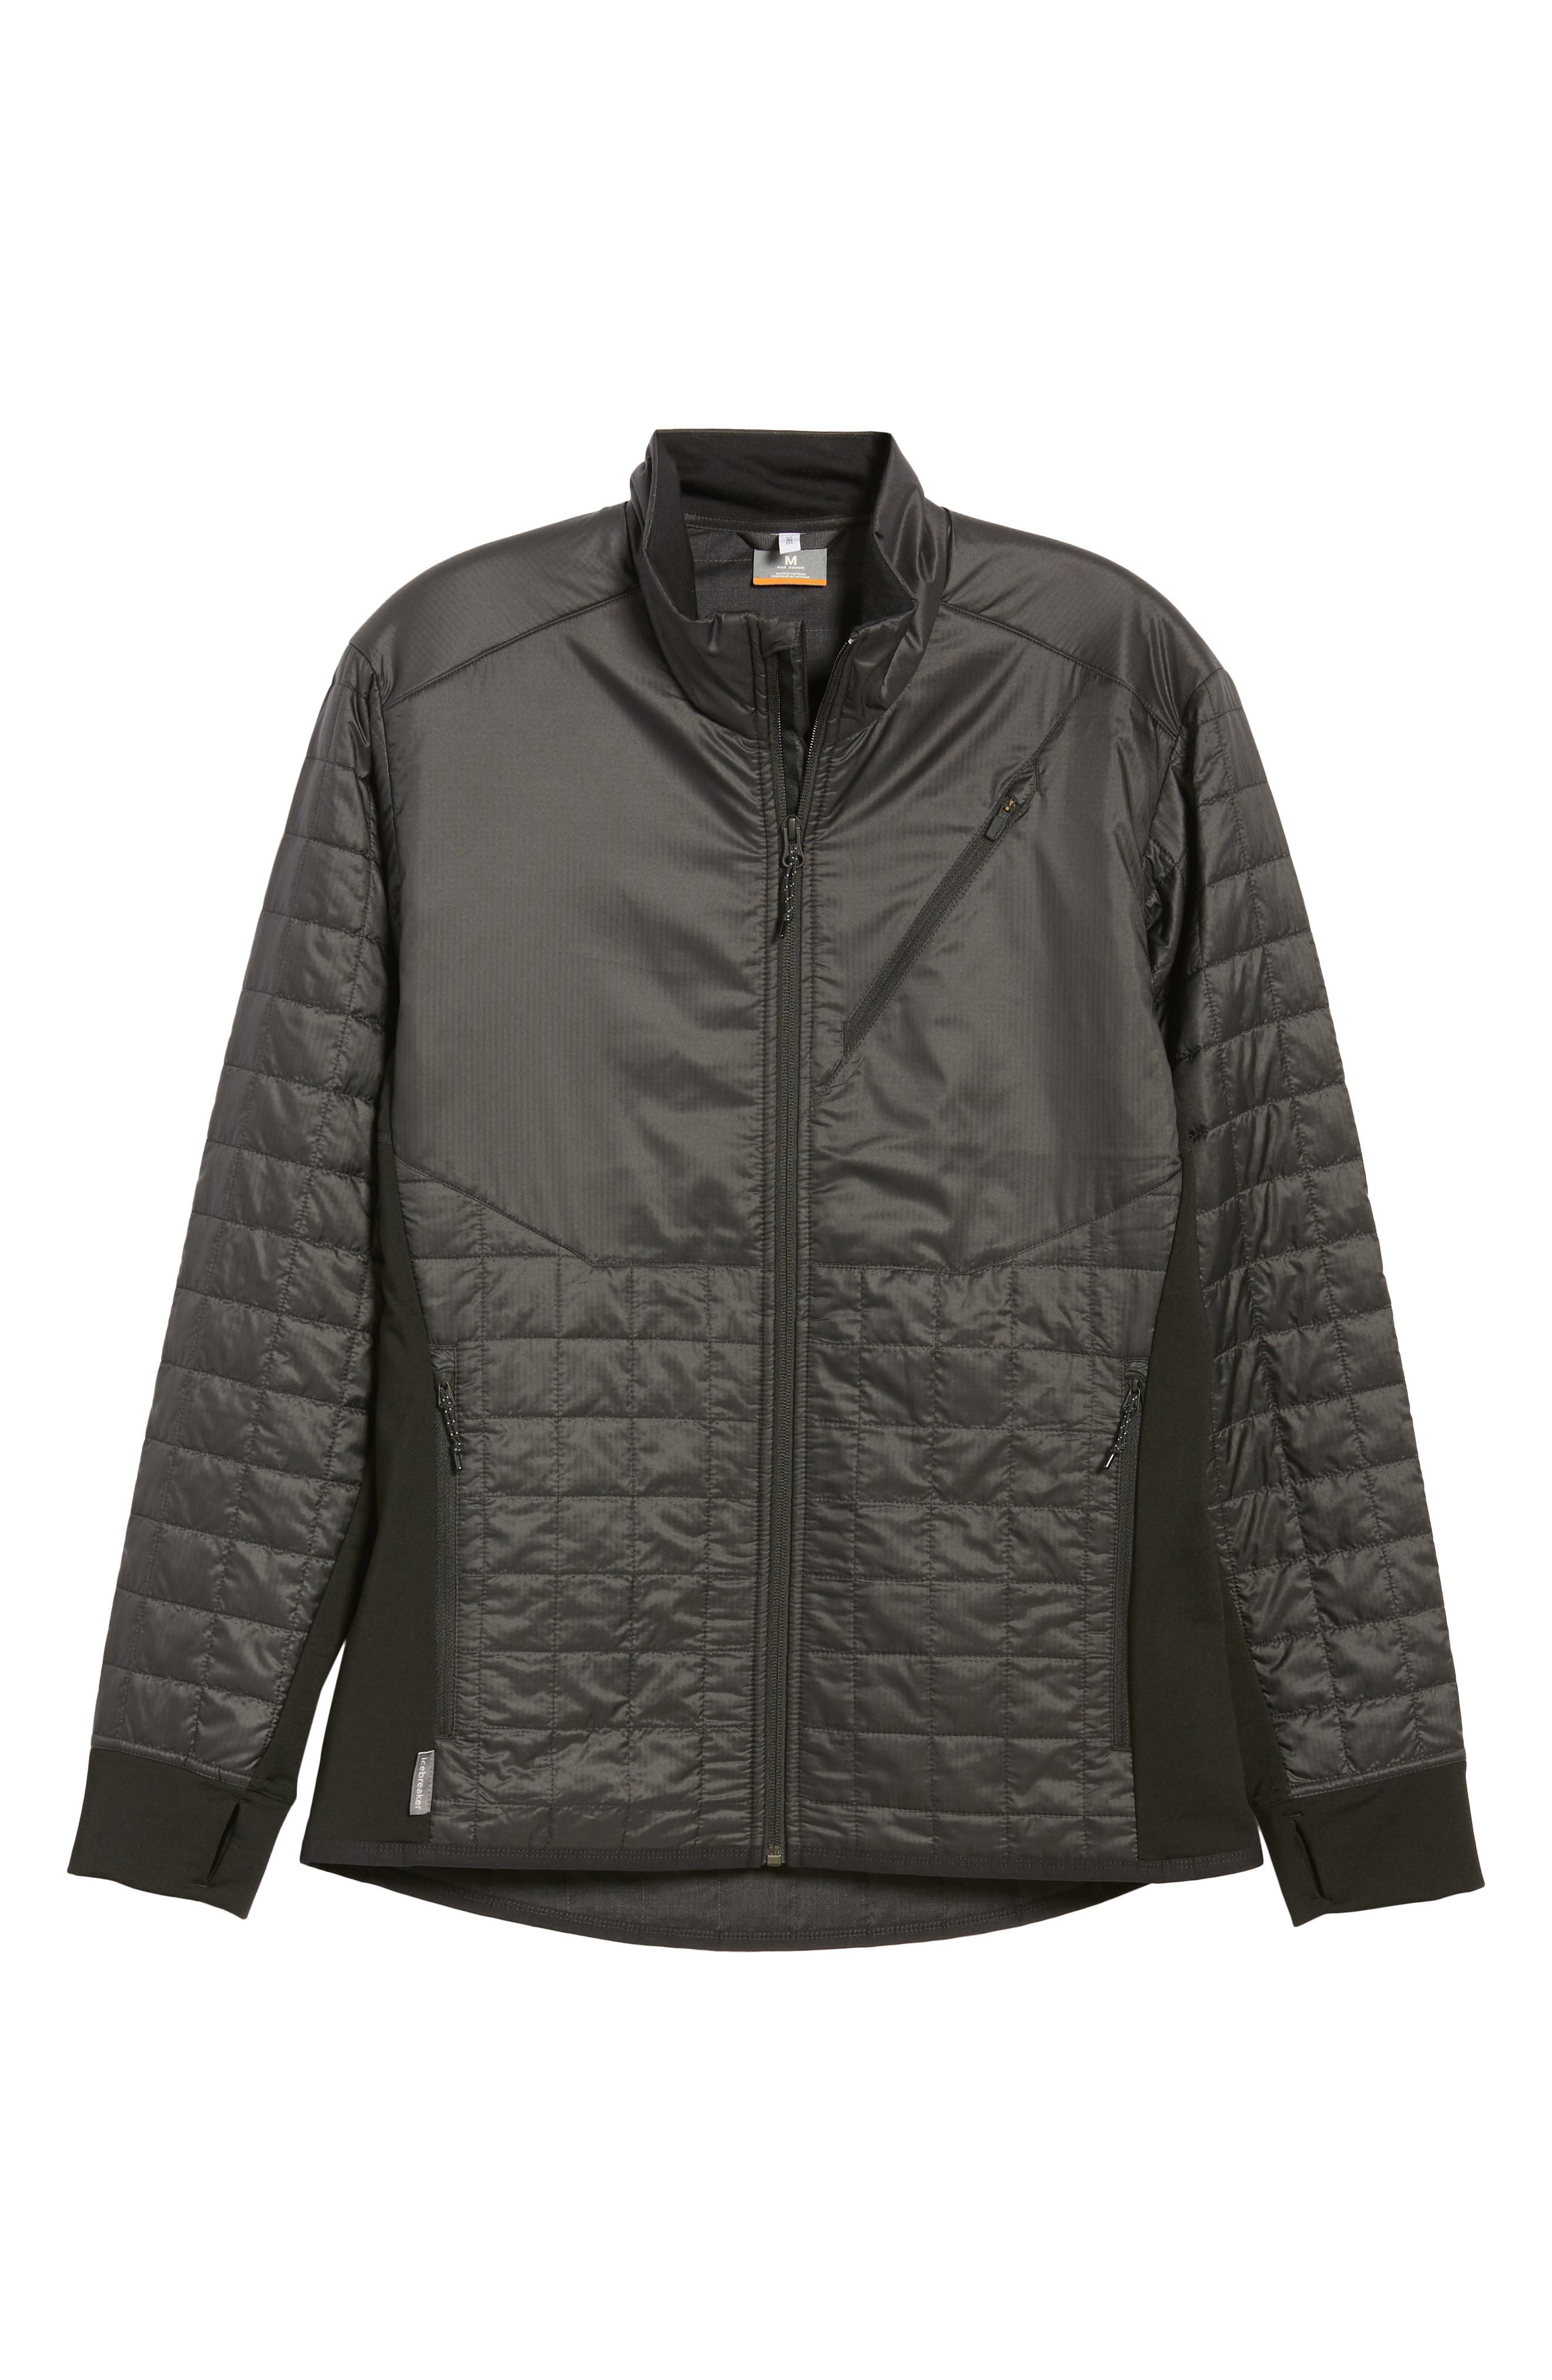 MerinoLOFT<sup>™</sup> Helix Midlayer Zip Jacket,                             Alternate thumbnail 6, color,                             BLACK/ JET HEATHER